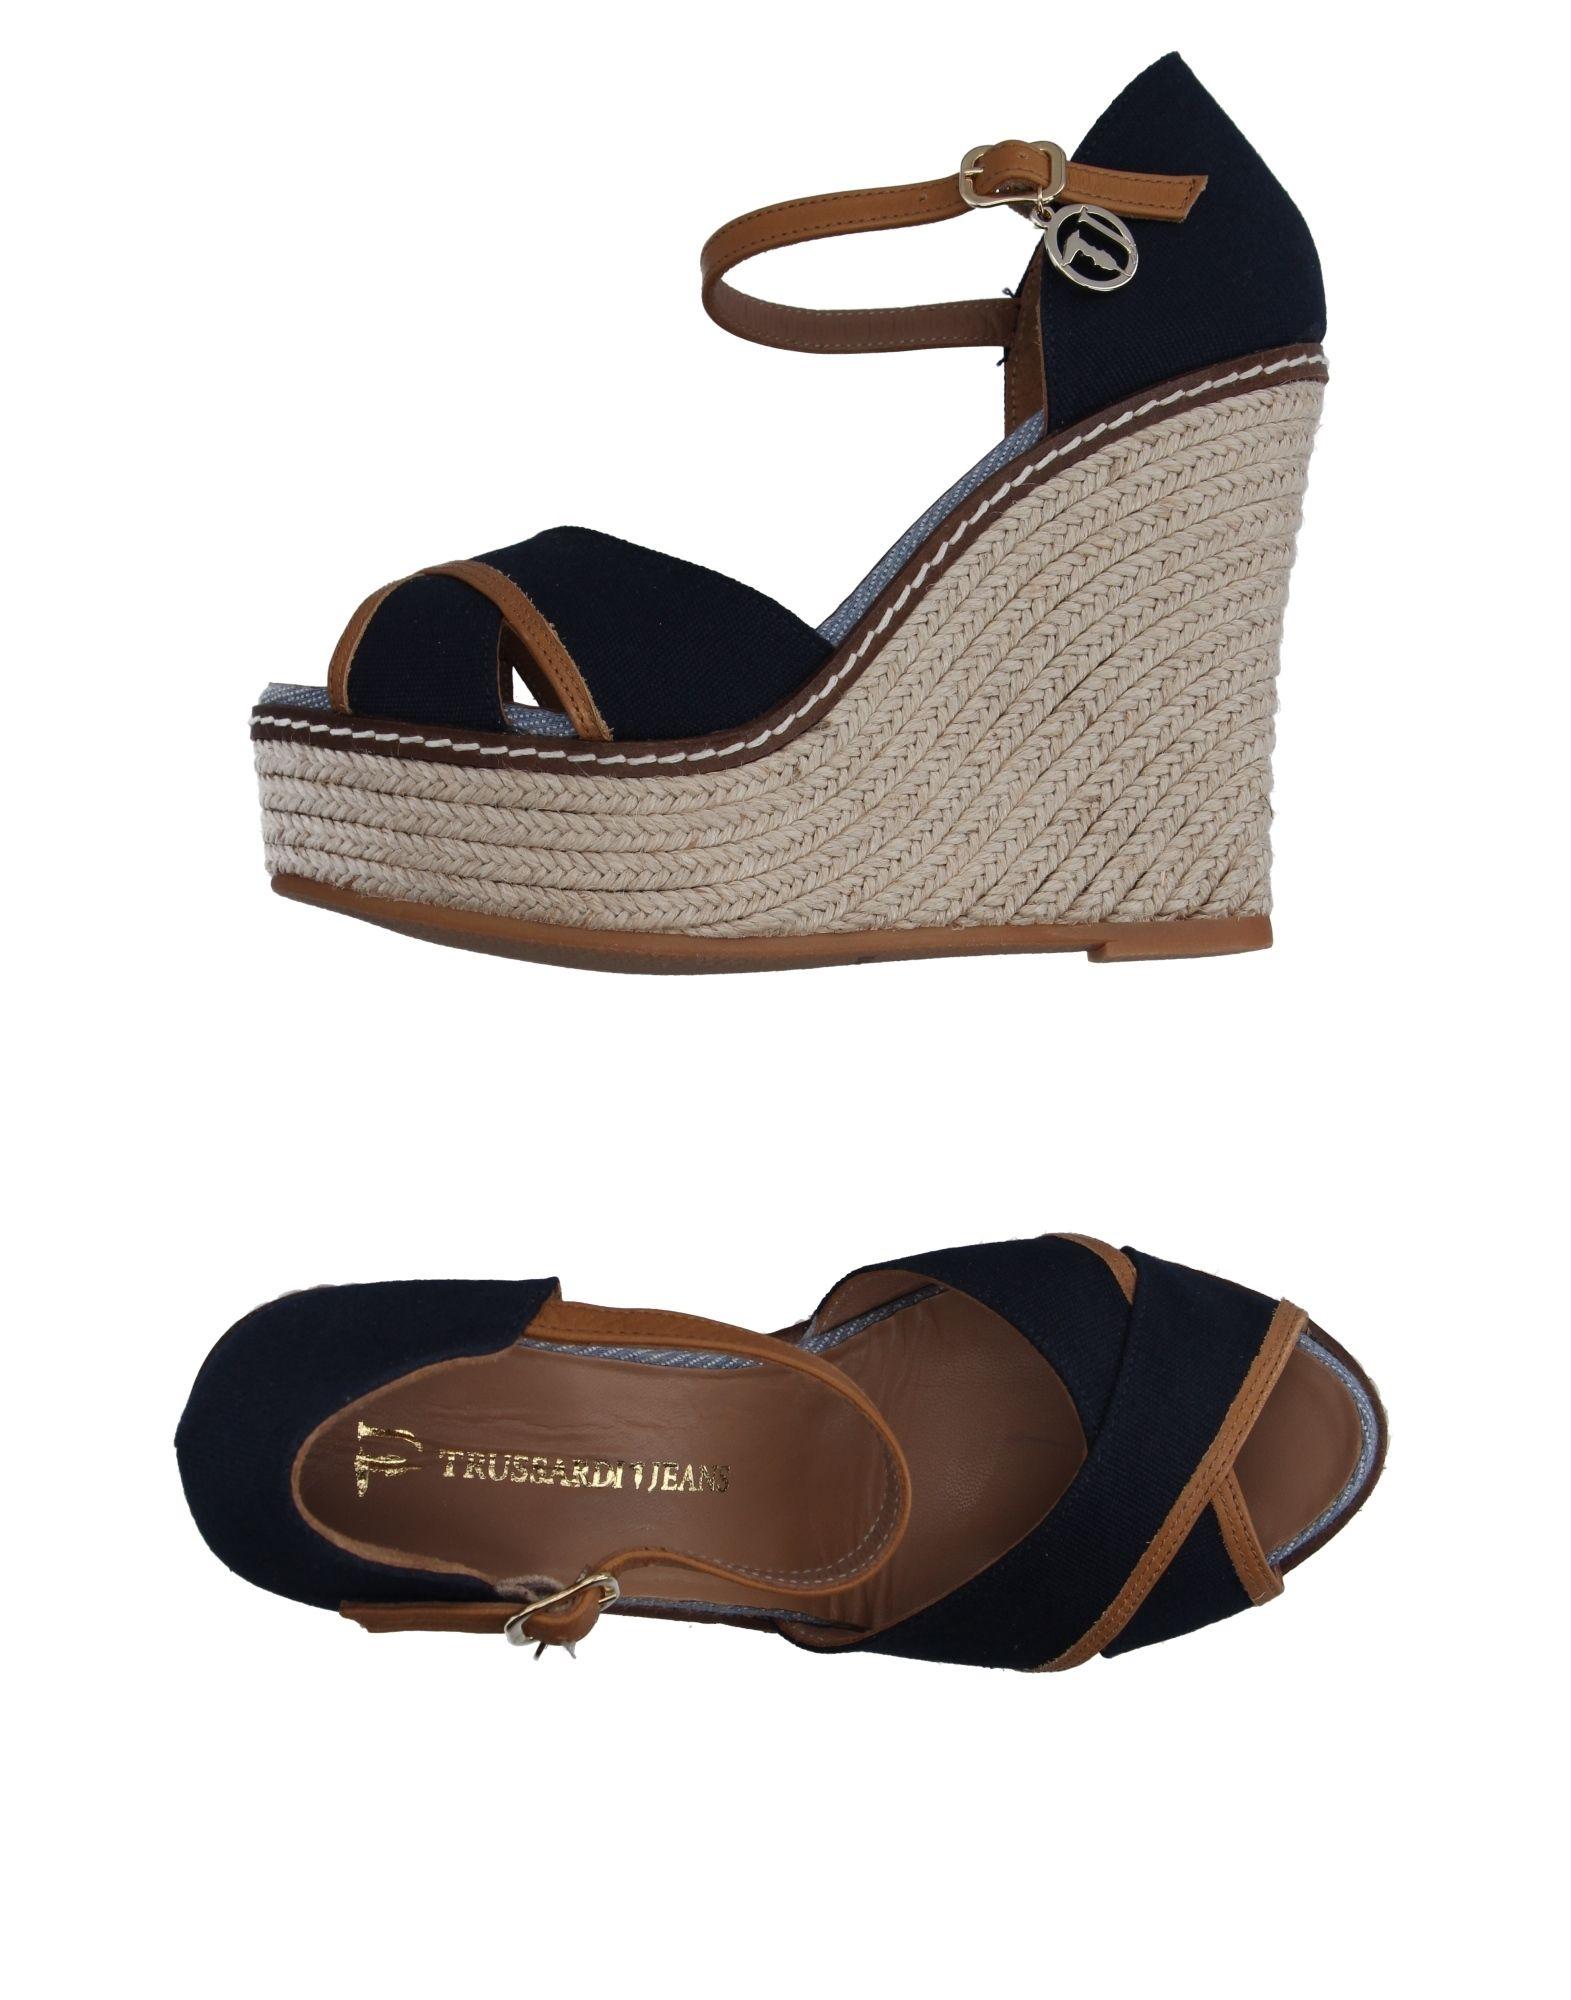 8a3b465b8d500c Trussardi Jeans Espadrilles - Women Trussardi Jeans Espadrilles ...